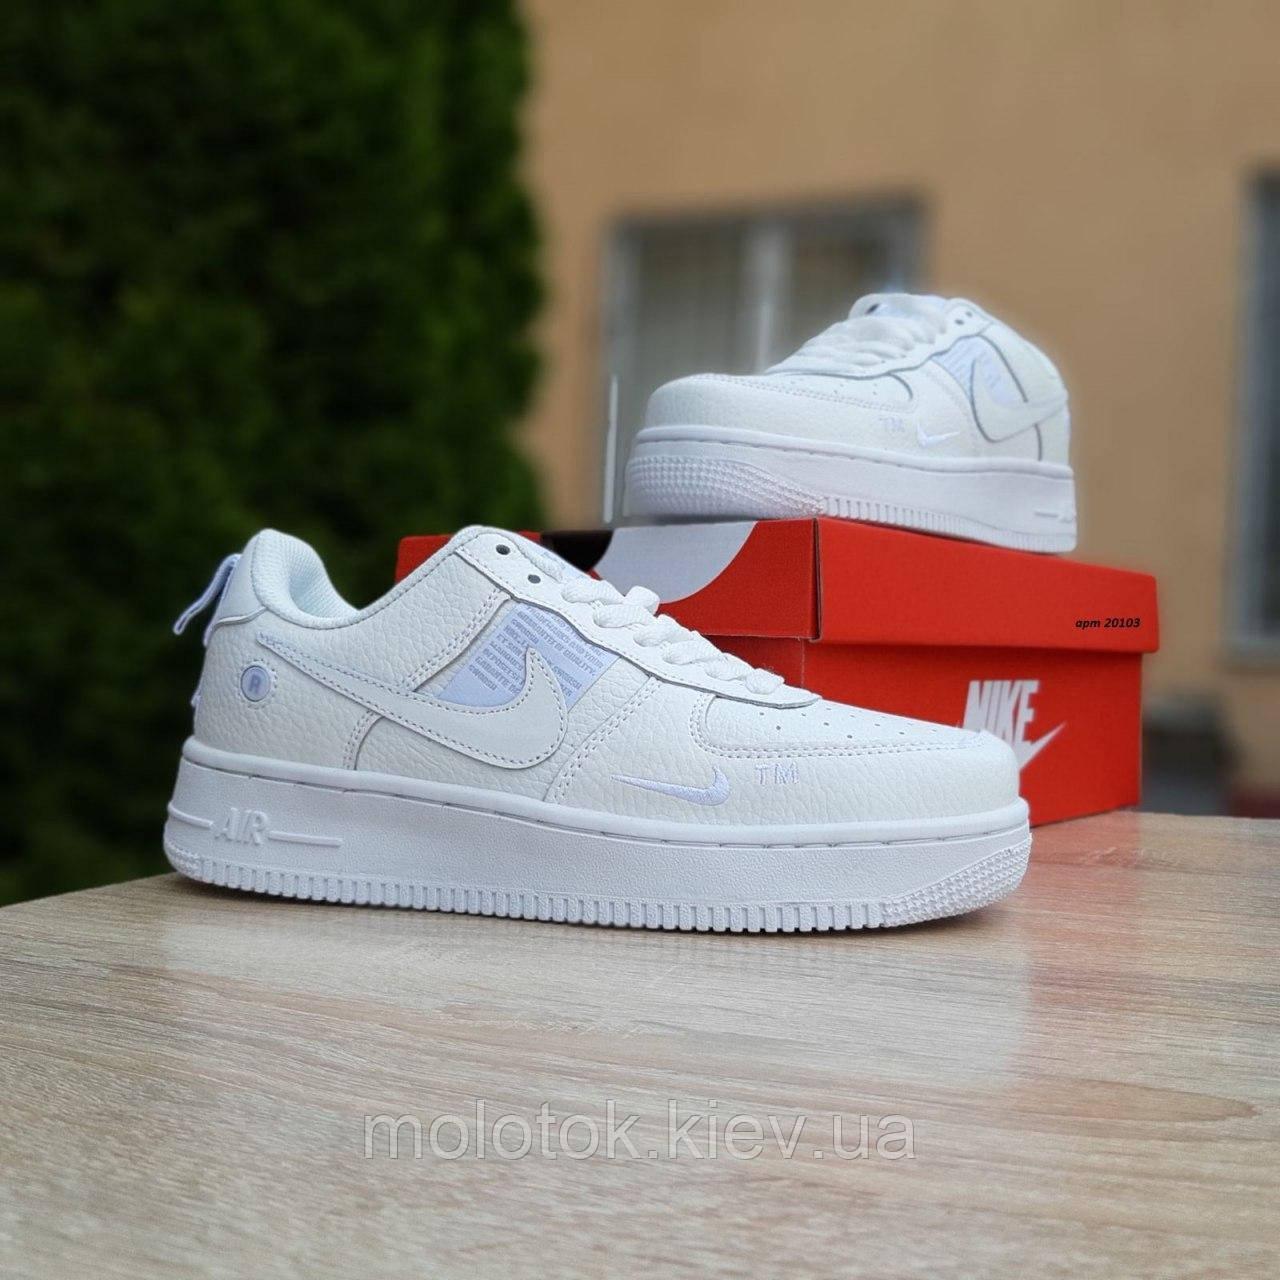 Женские кроссовки в стиле Nike Air Force 1 LV8 белые